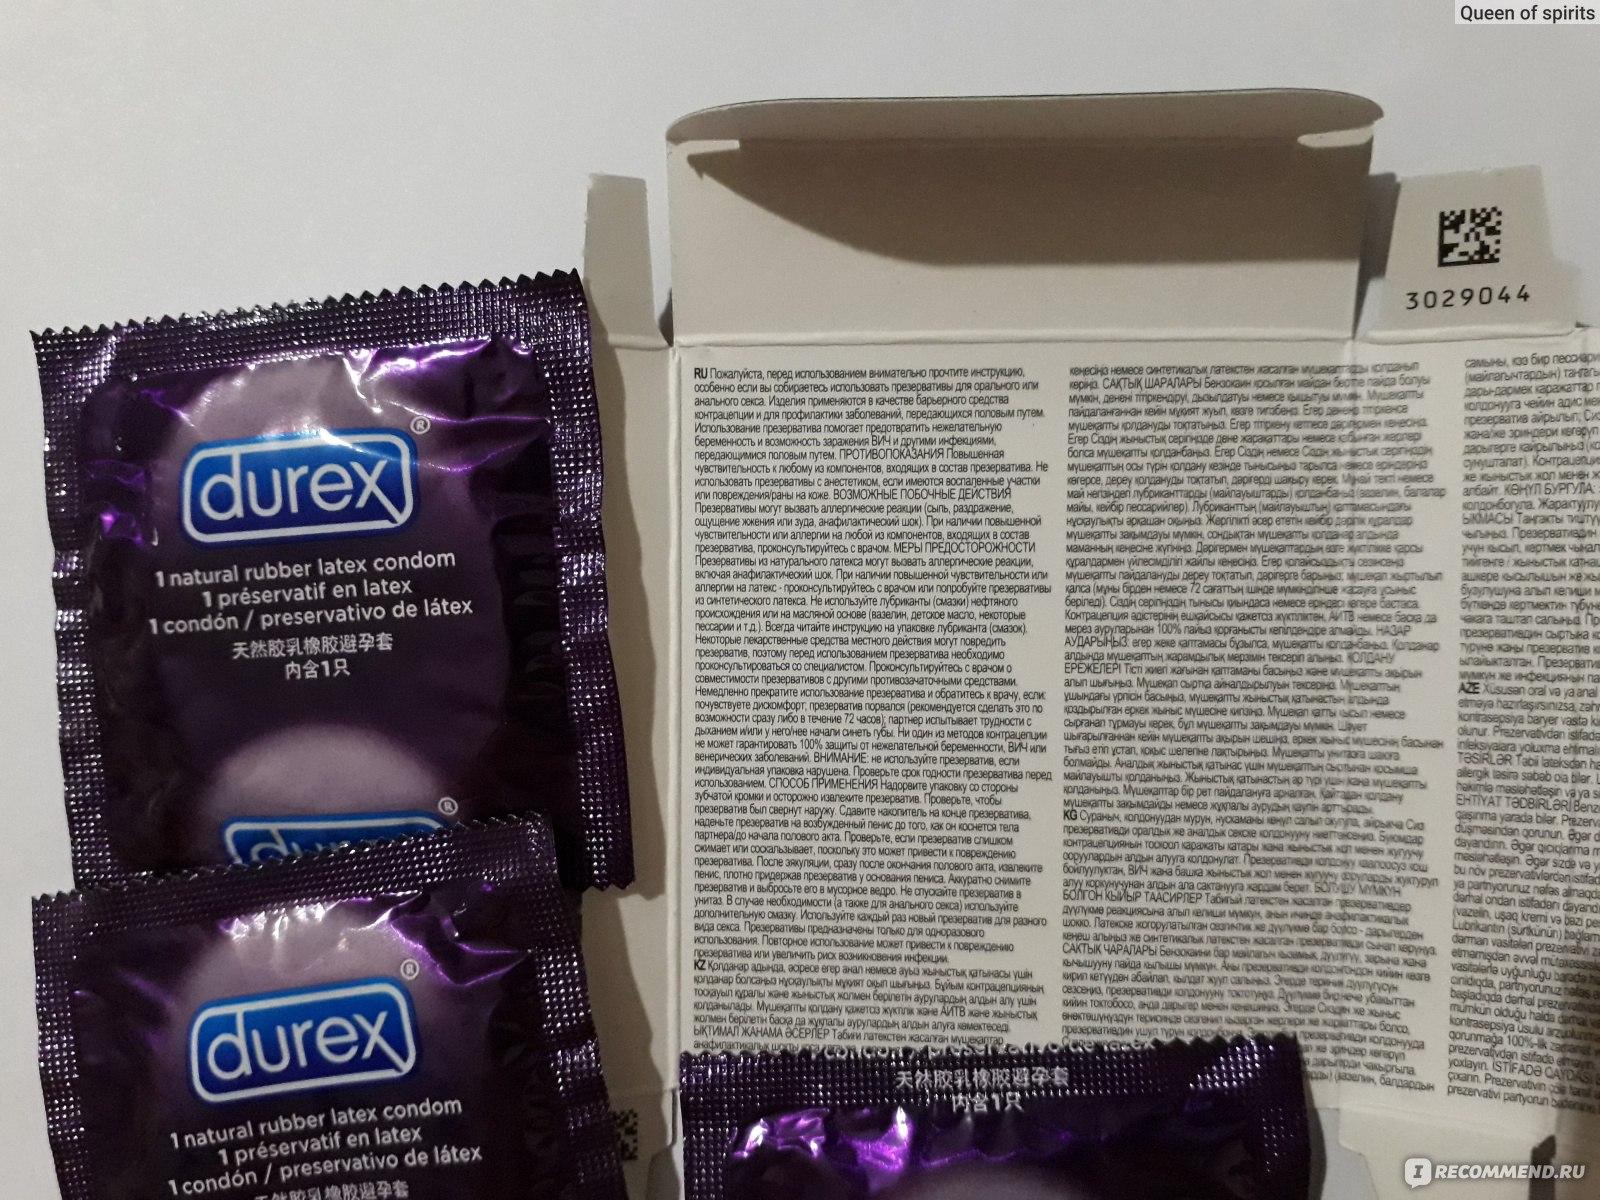 Секс с презервативом кому нравится